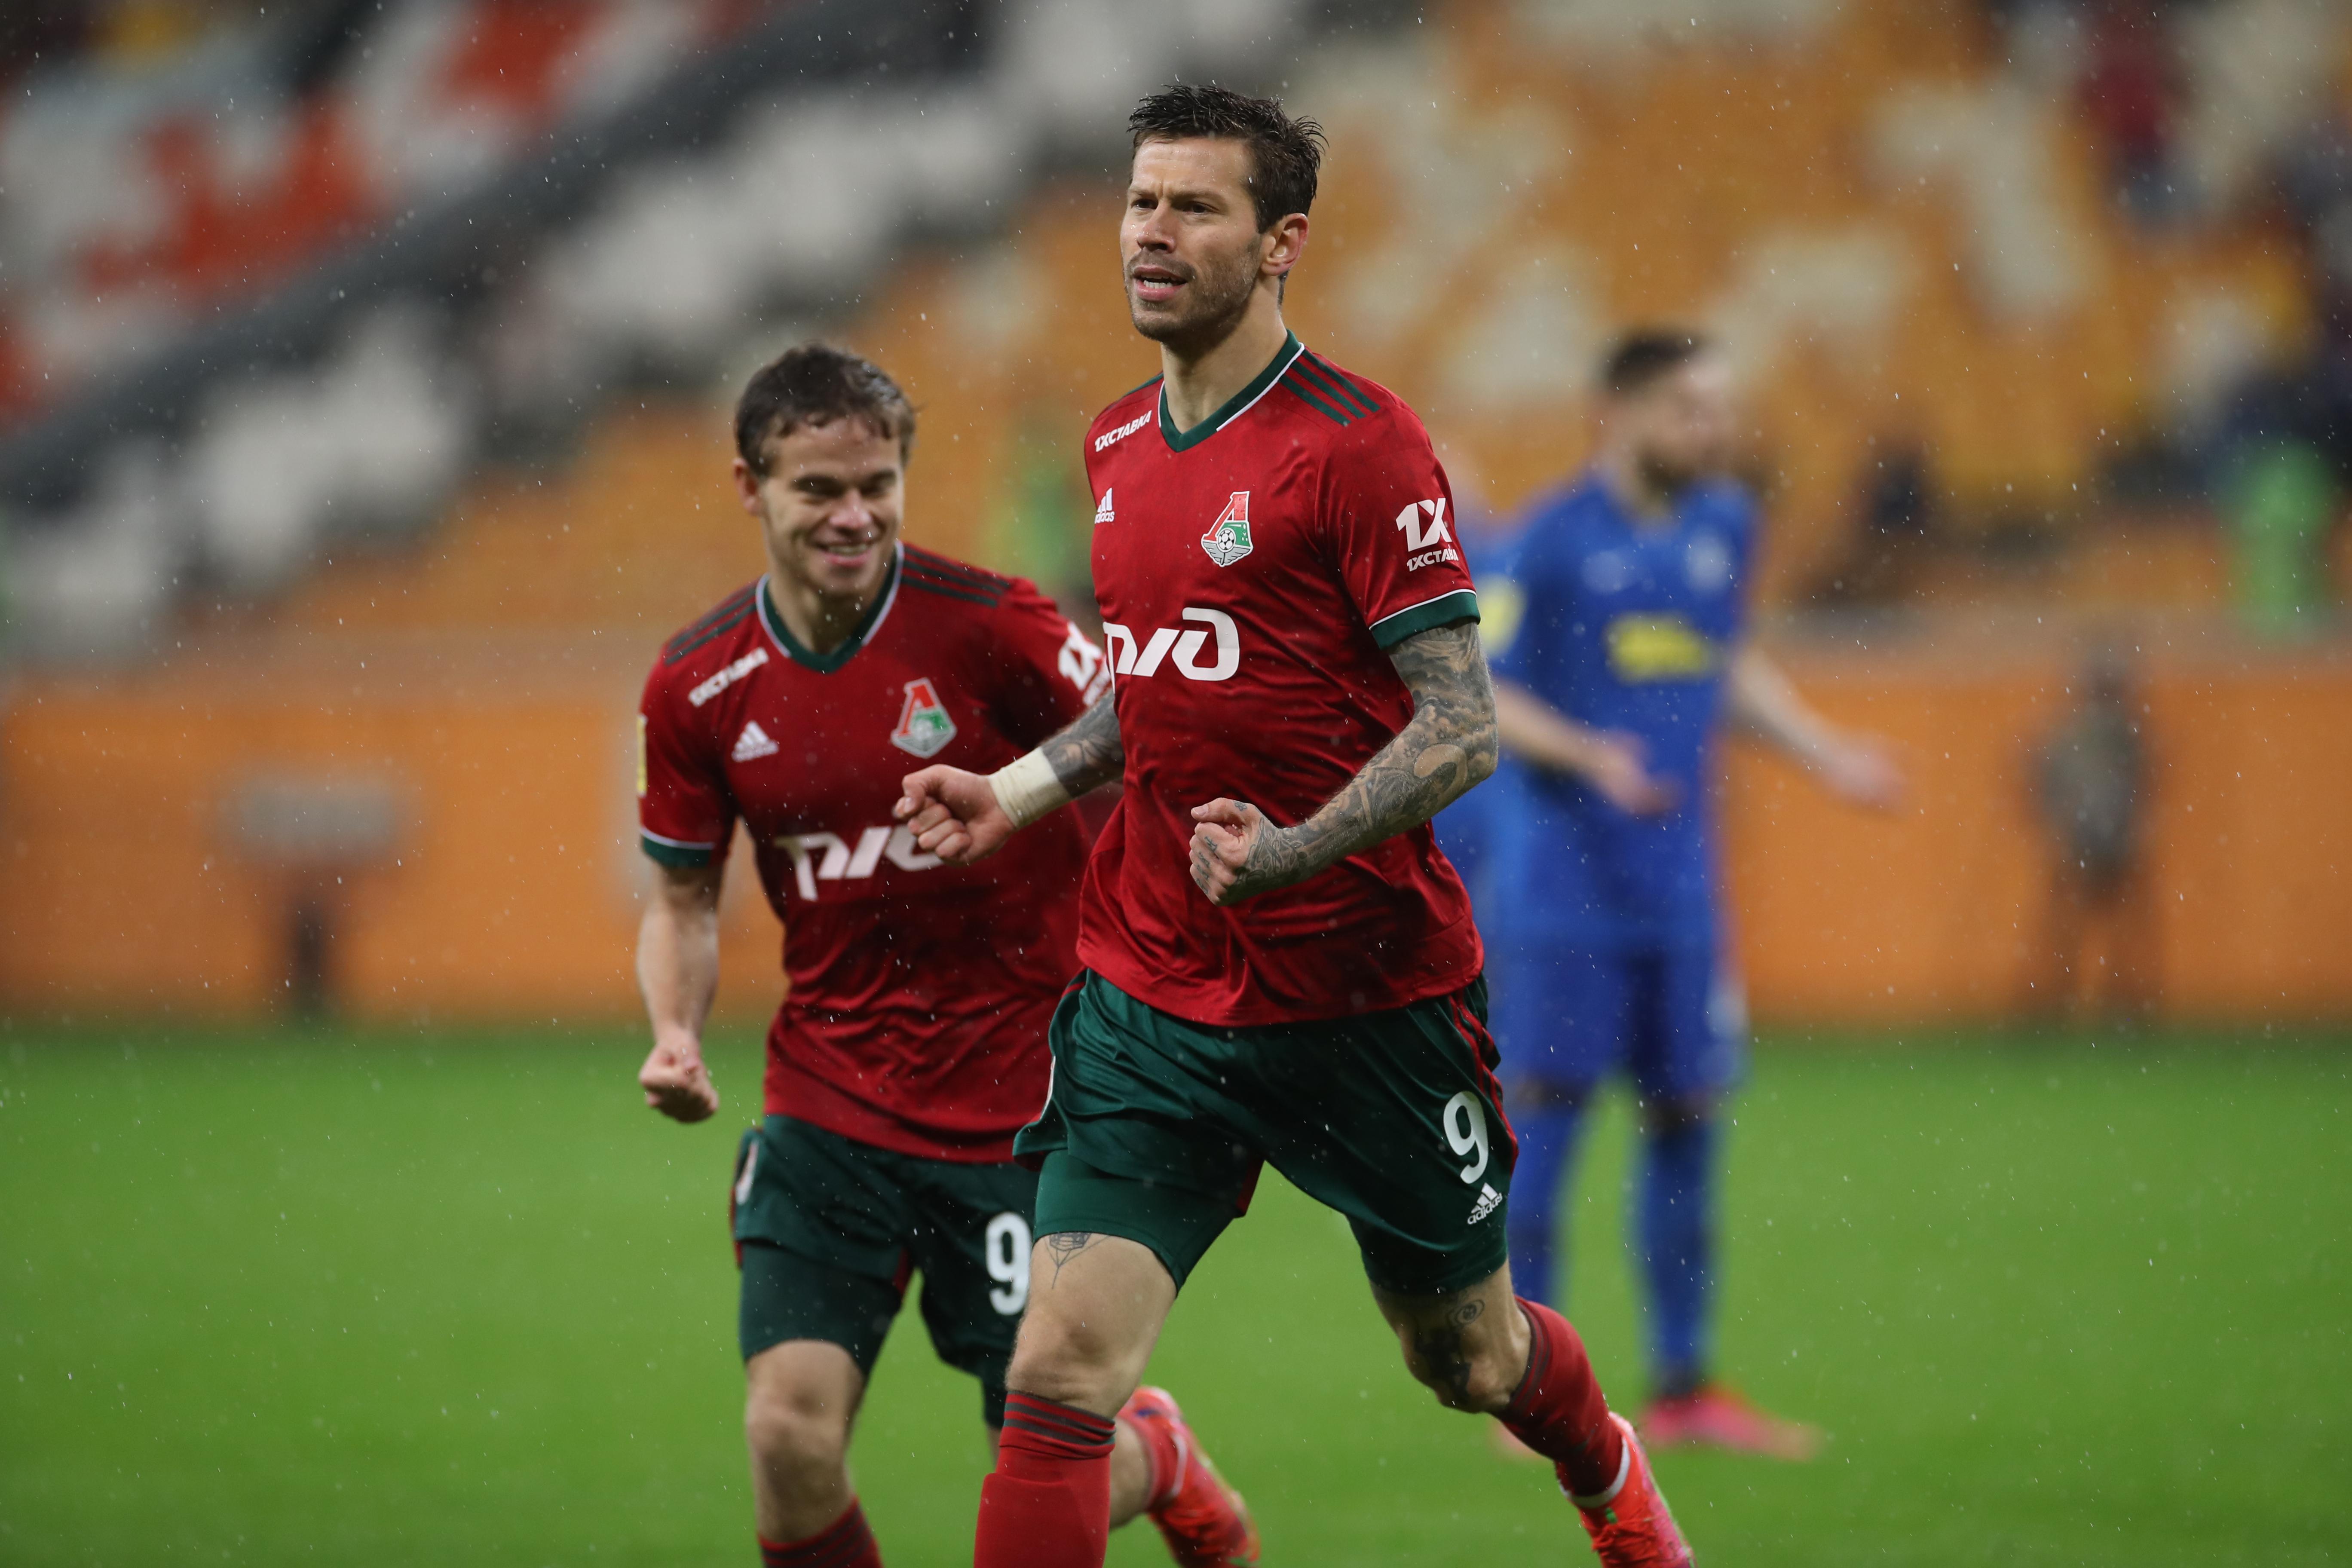 «Тамбов» – «Локомотив» – 2:5